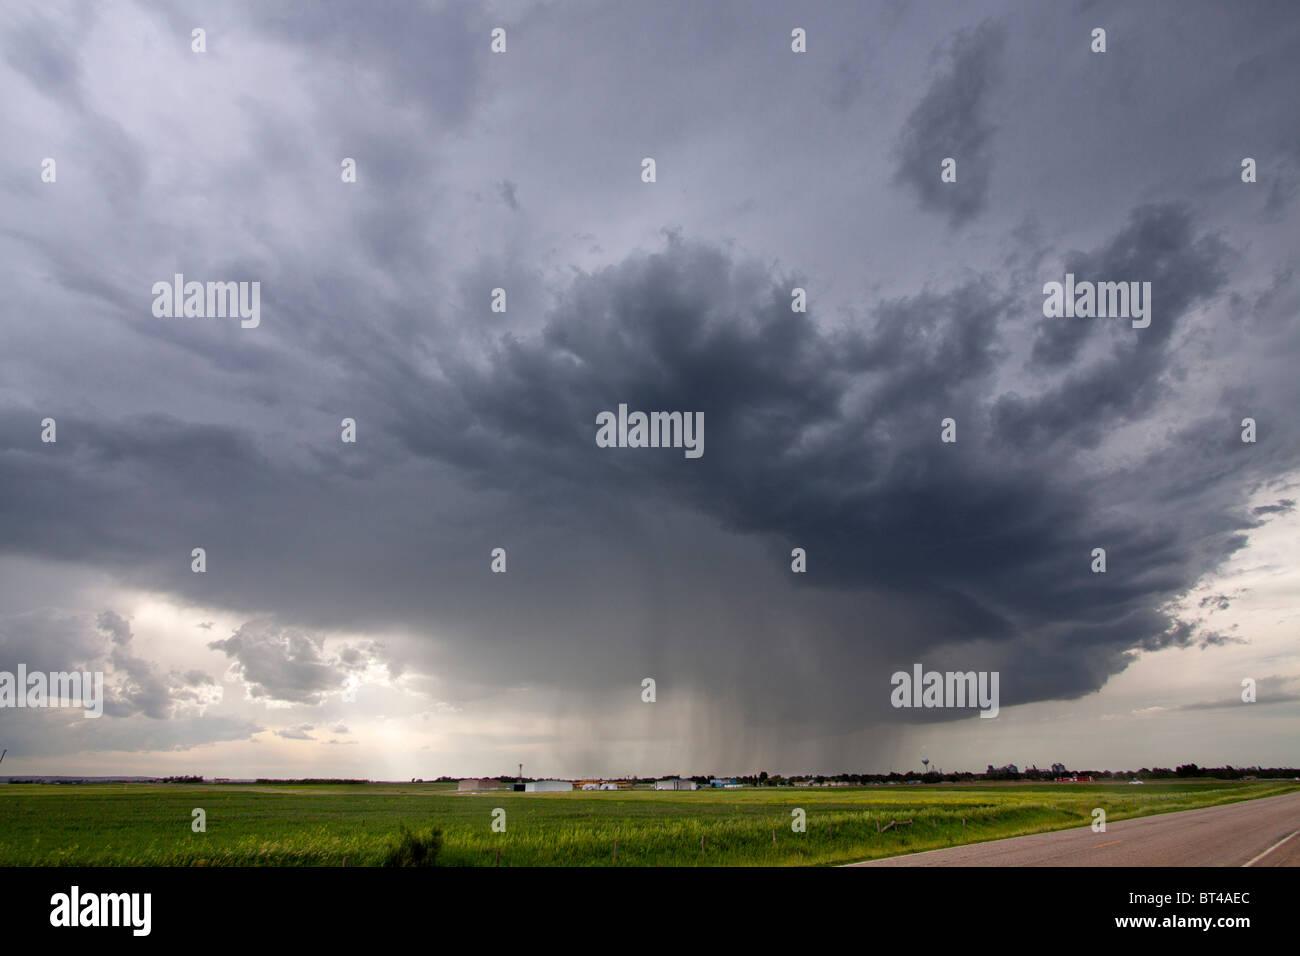 A thunderstorm fires up near Pickstown, South Dakota, USA, June 3, 2010. - Stock Image